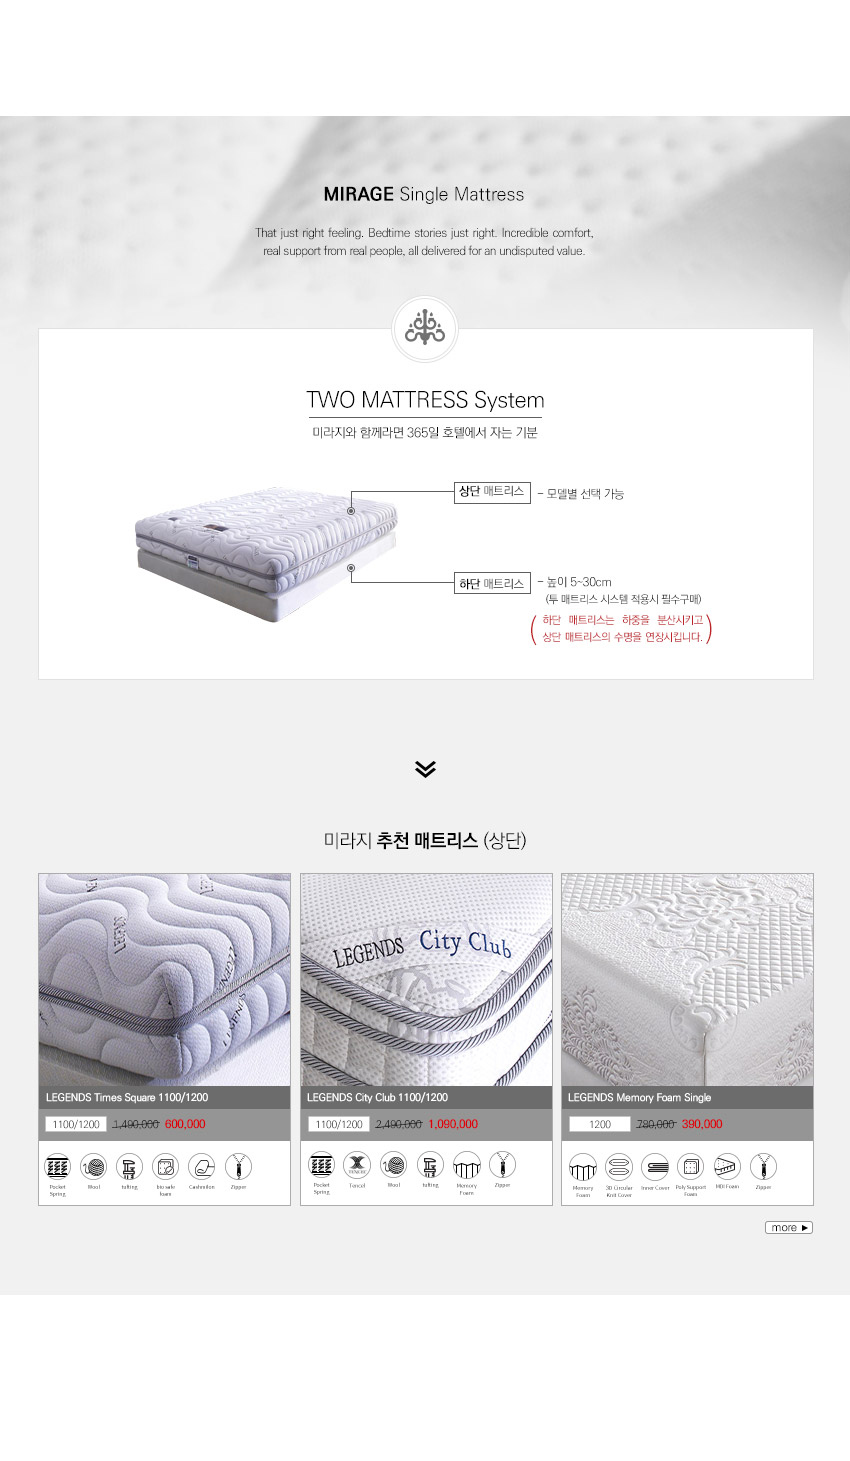 mattress-more-single-Top.jpg